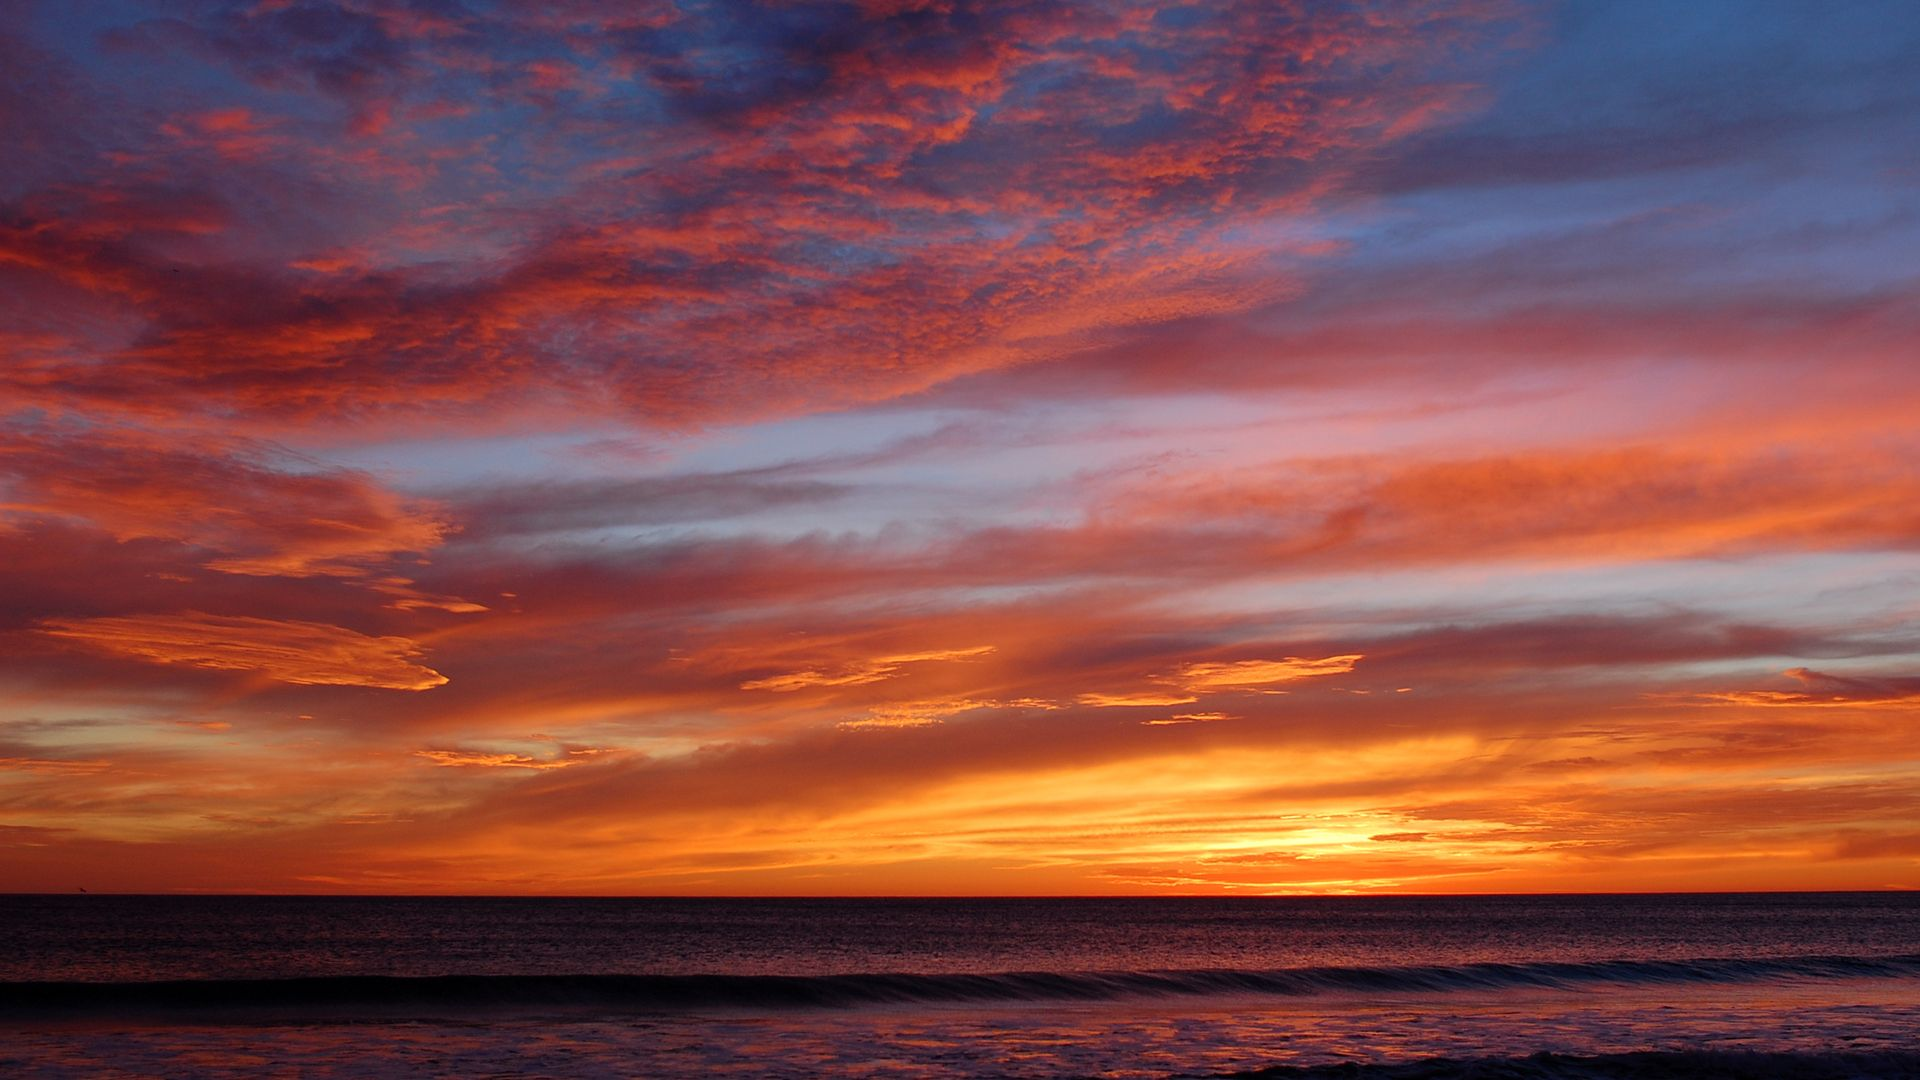 Group of pin hd sfondi tramonto for Sfondi desktop tramonti mare